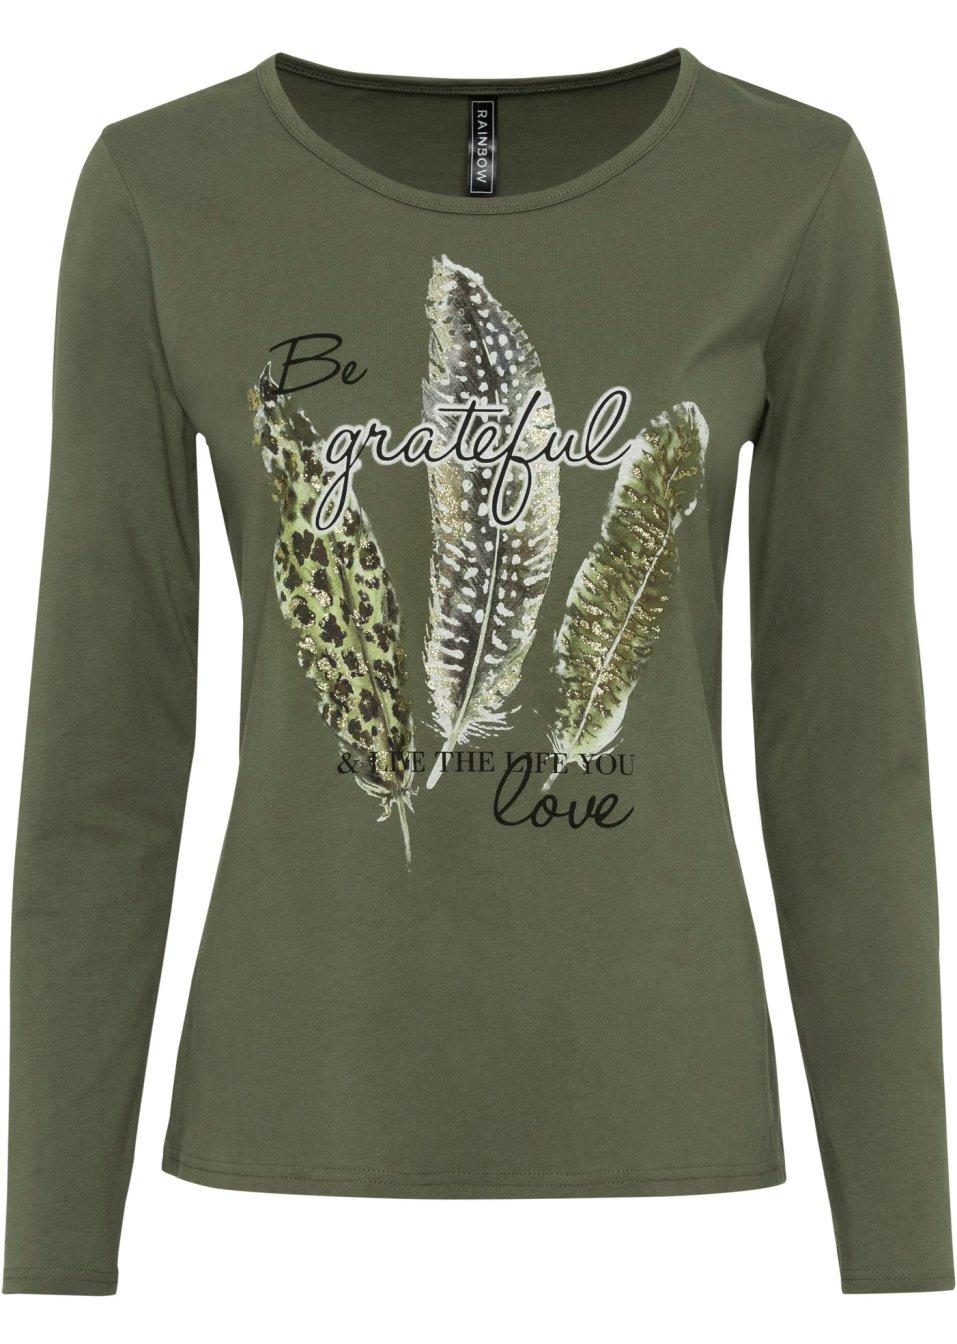 Langarmshirt mit Federdruck oliv bedruckt - Damen - bonprix.de 0AStY HHati